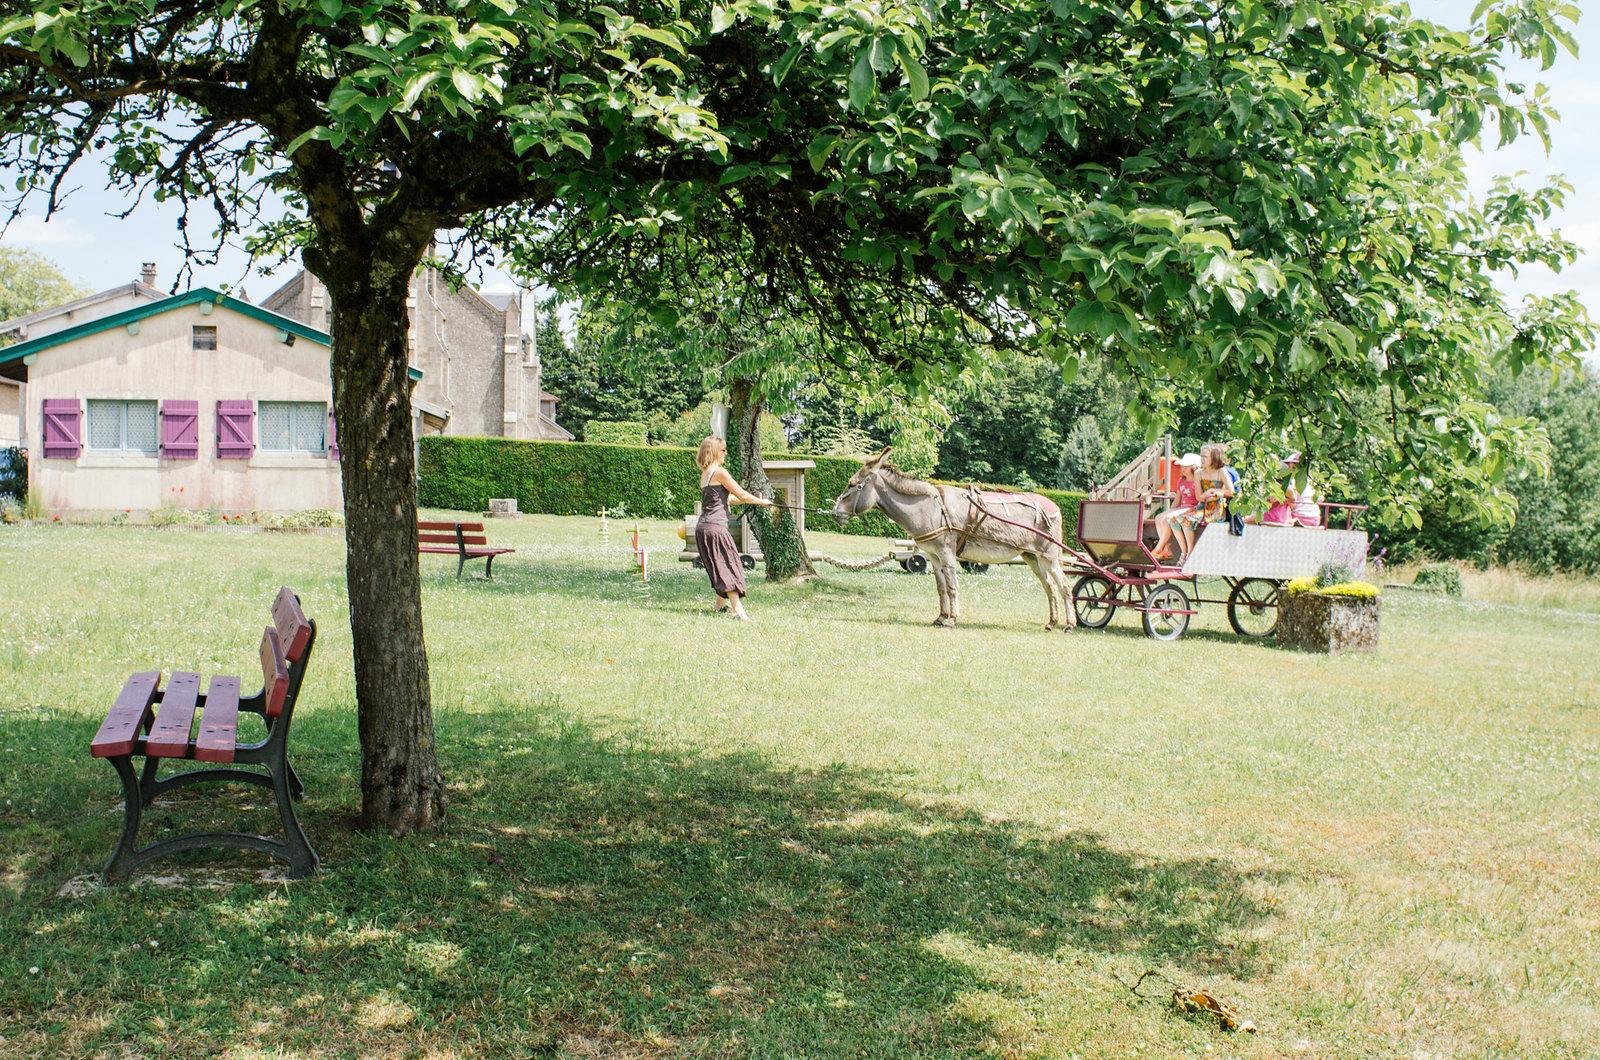 Randonner en Argonne - Balade en ânes - Démarrage au starter